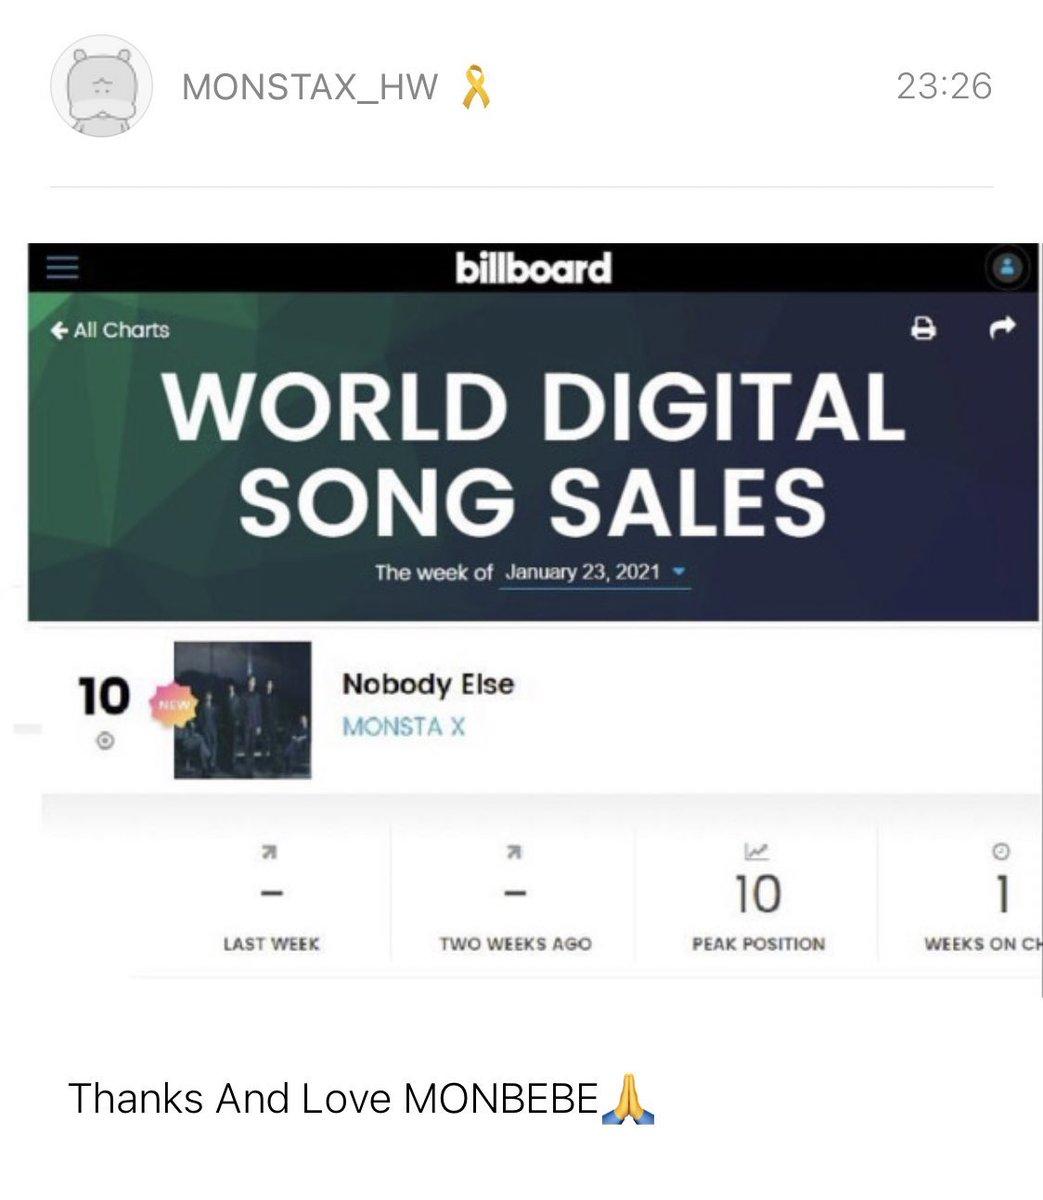 [ Mxtalktok 🐢💬:]  -Thanks and Love MONBEBE 🙏  -Monbebe i'm crying 😭